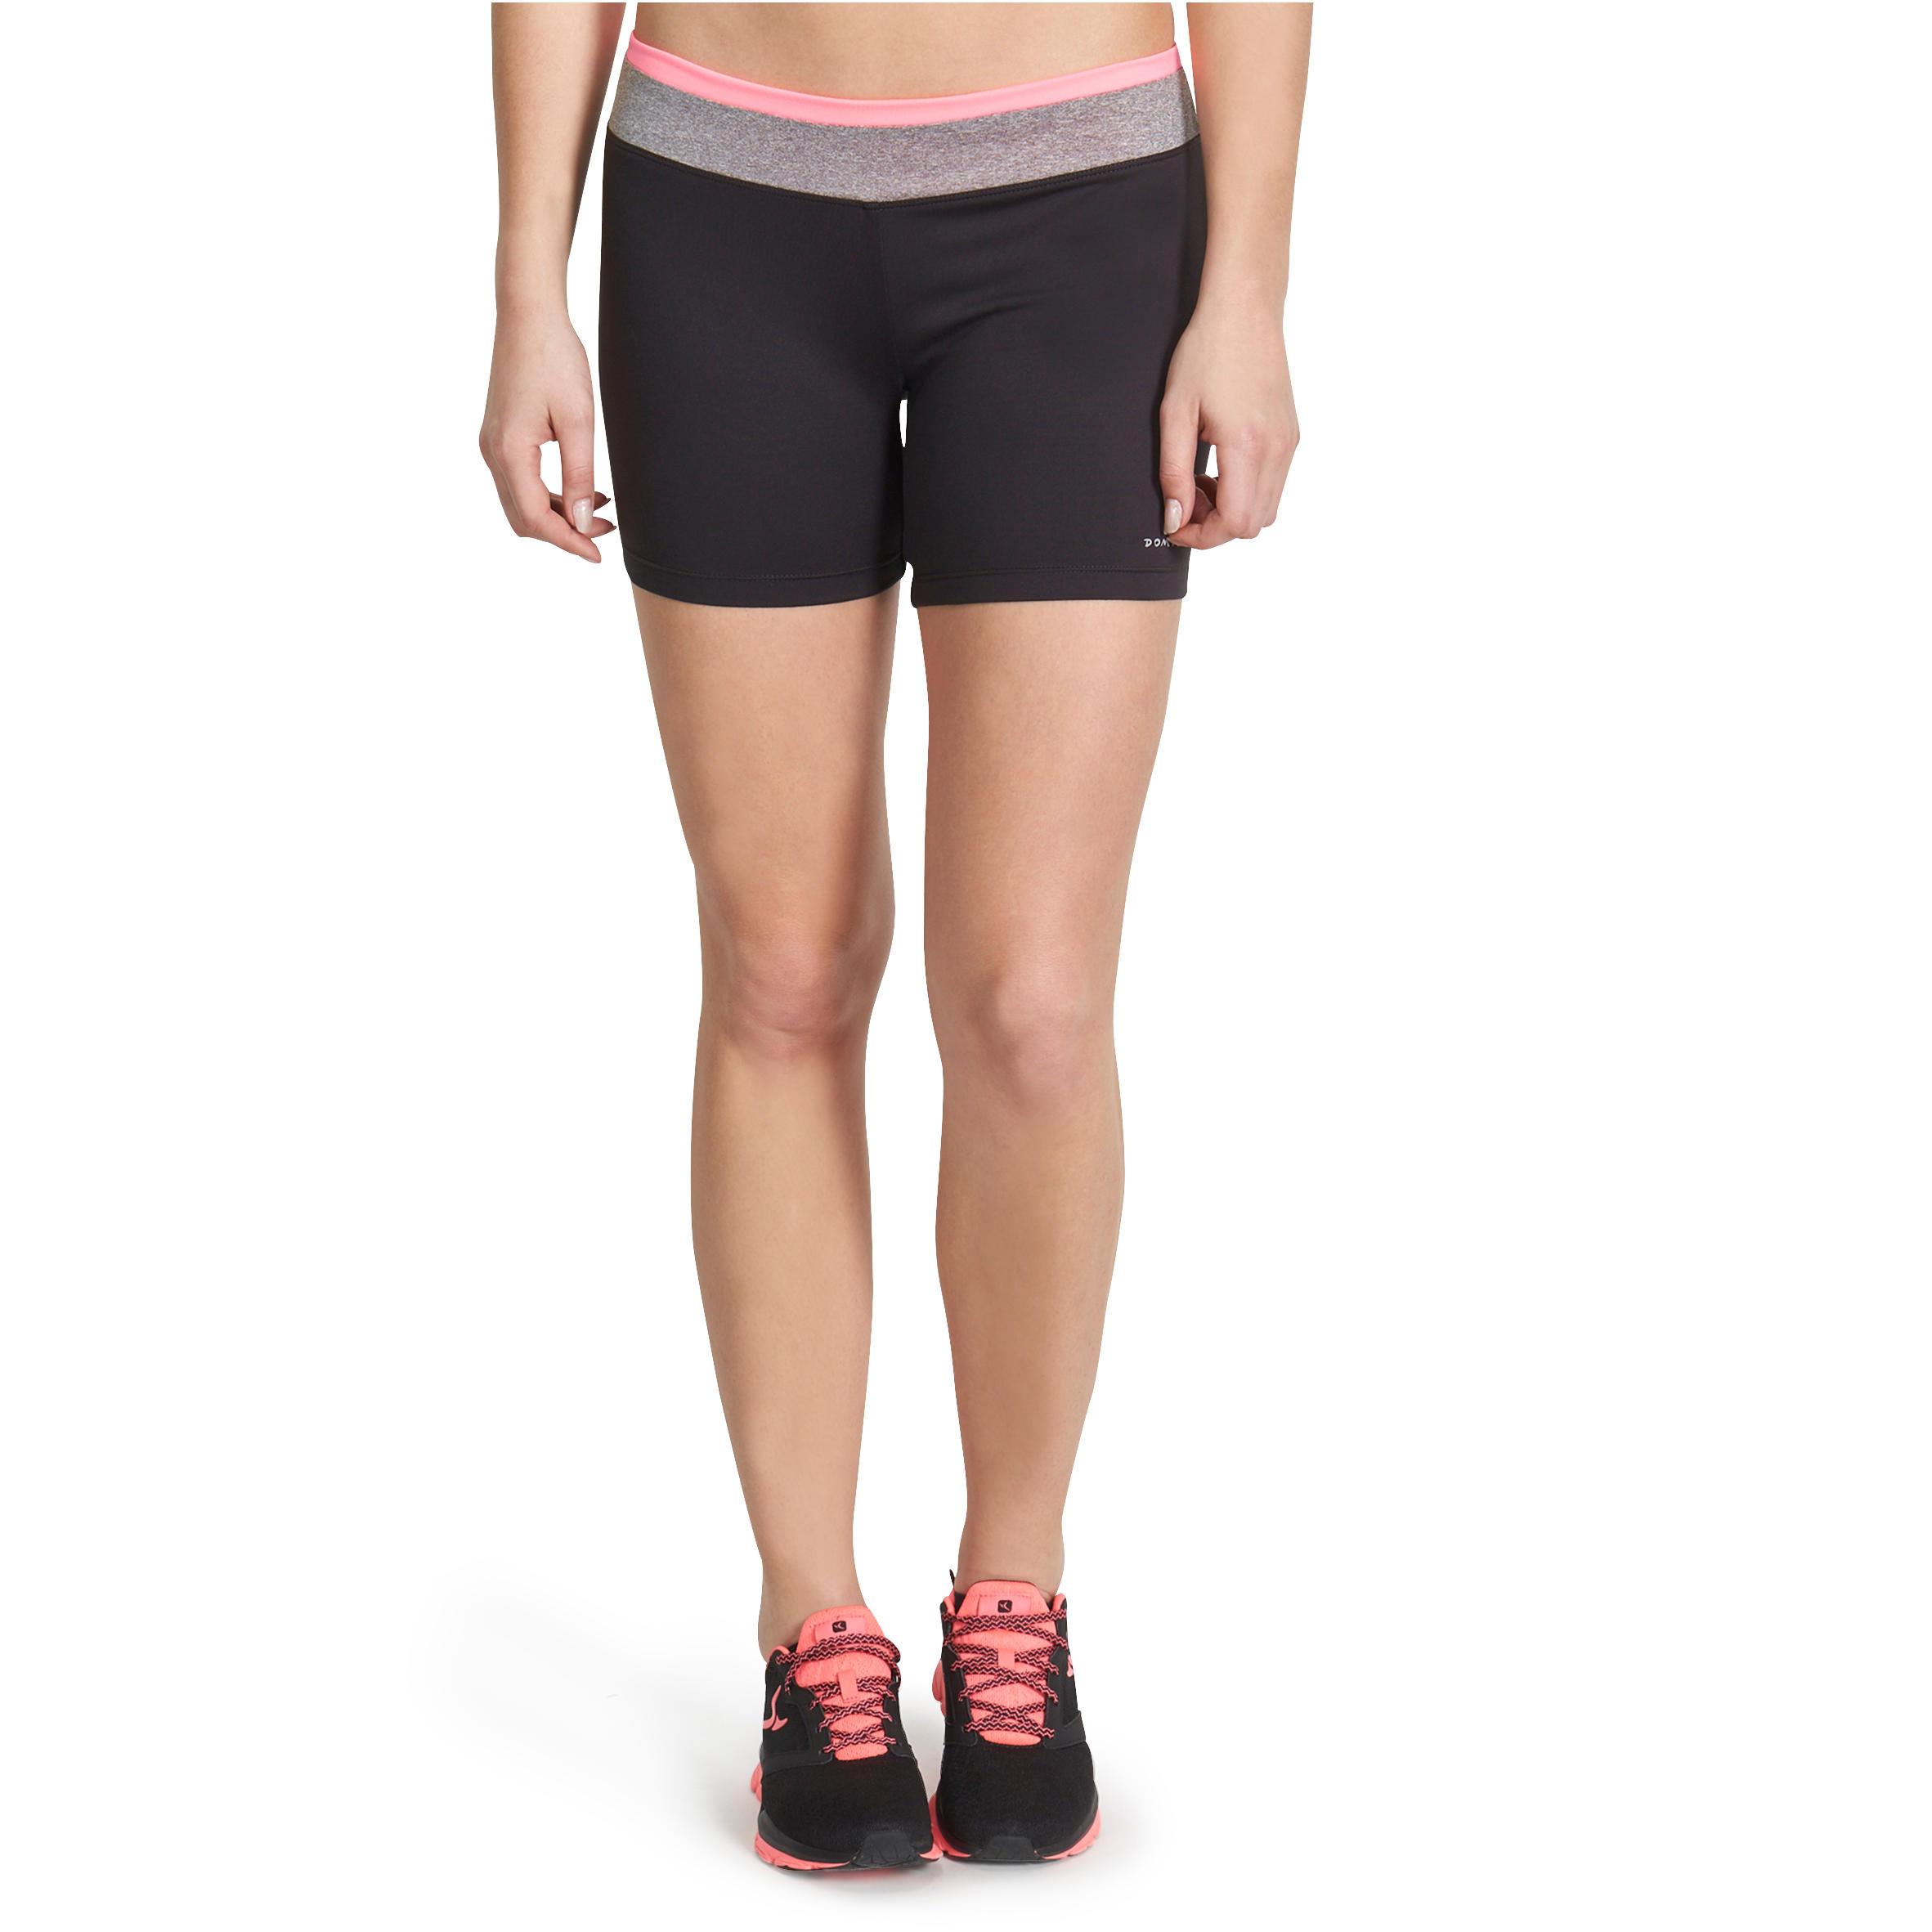 100 Women's Cardio Fitness Shorts - Black